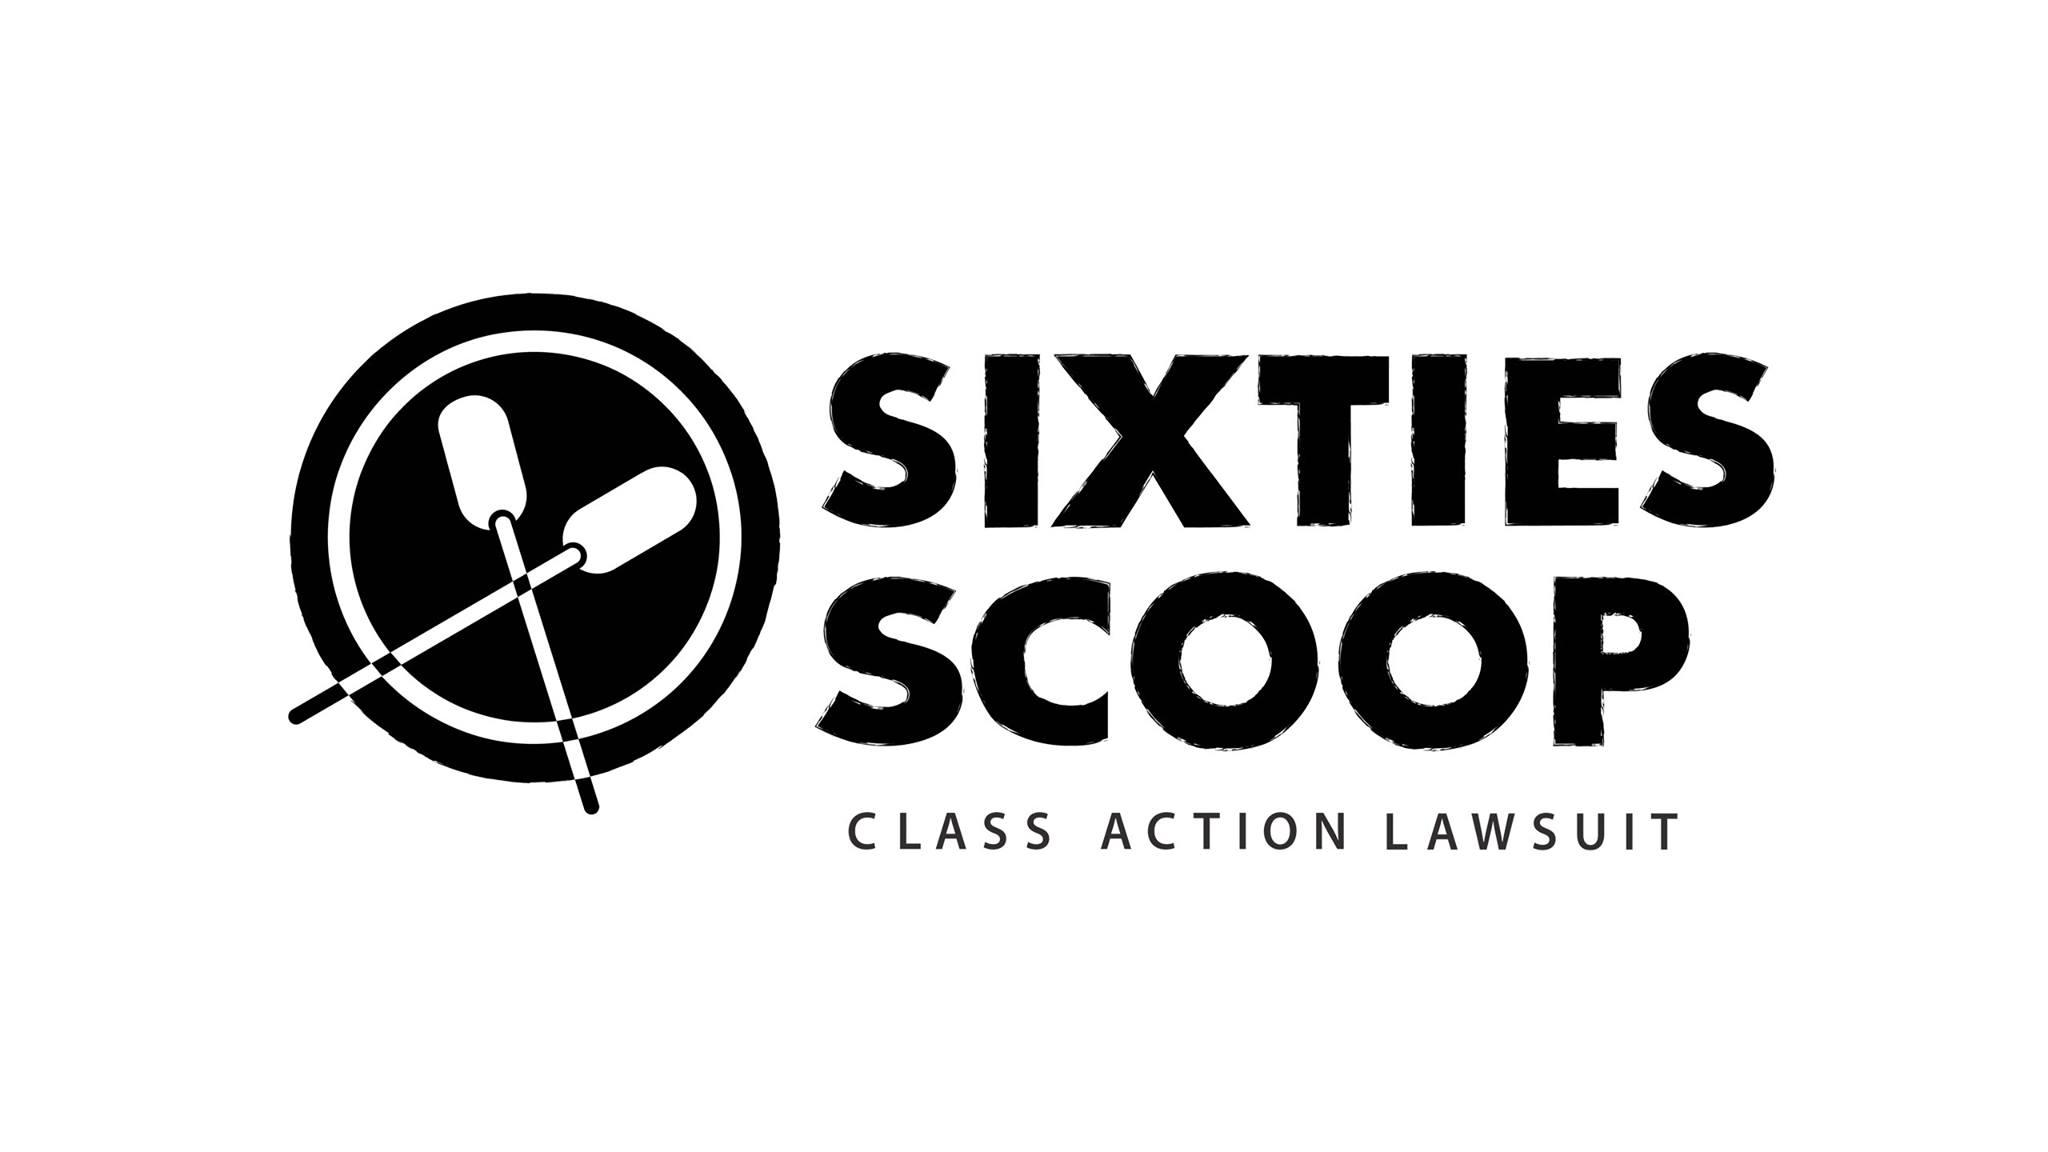 The Sixties Scoop Settlement